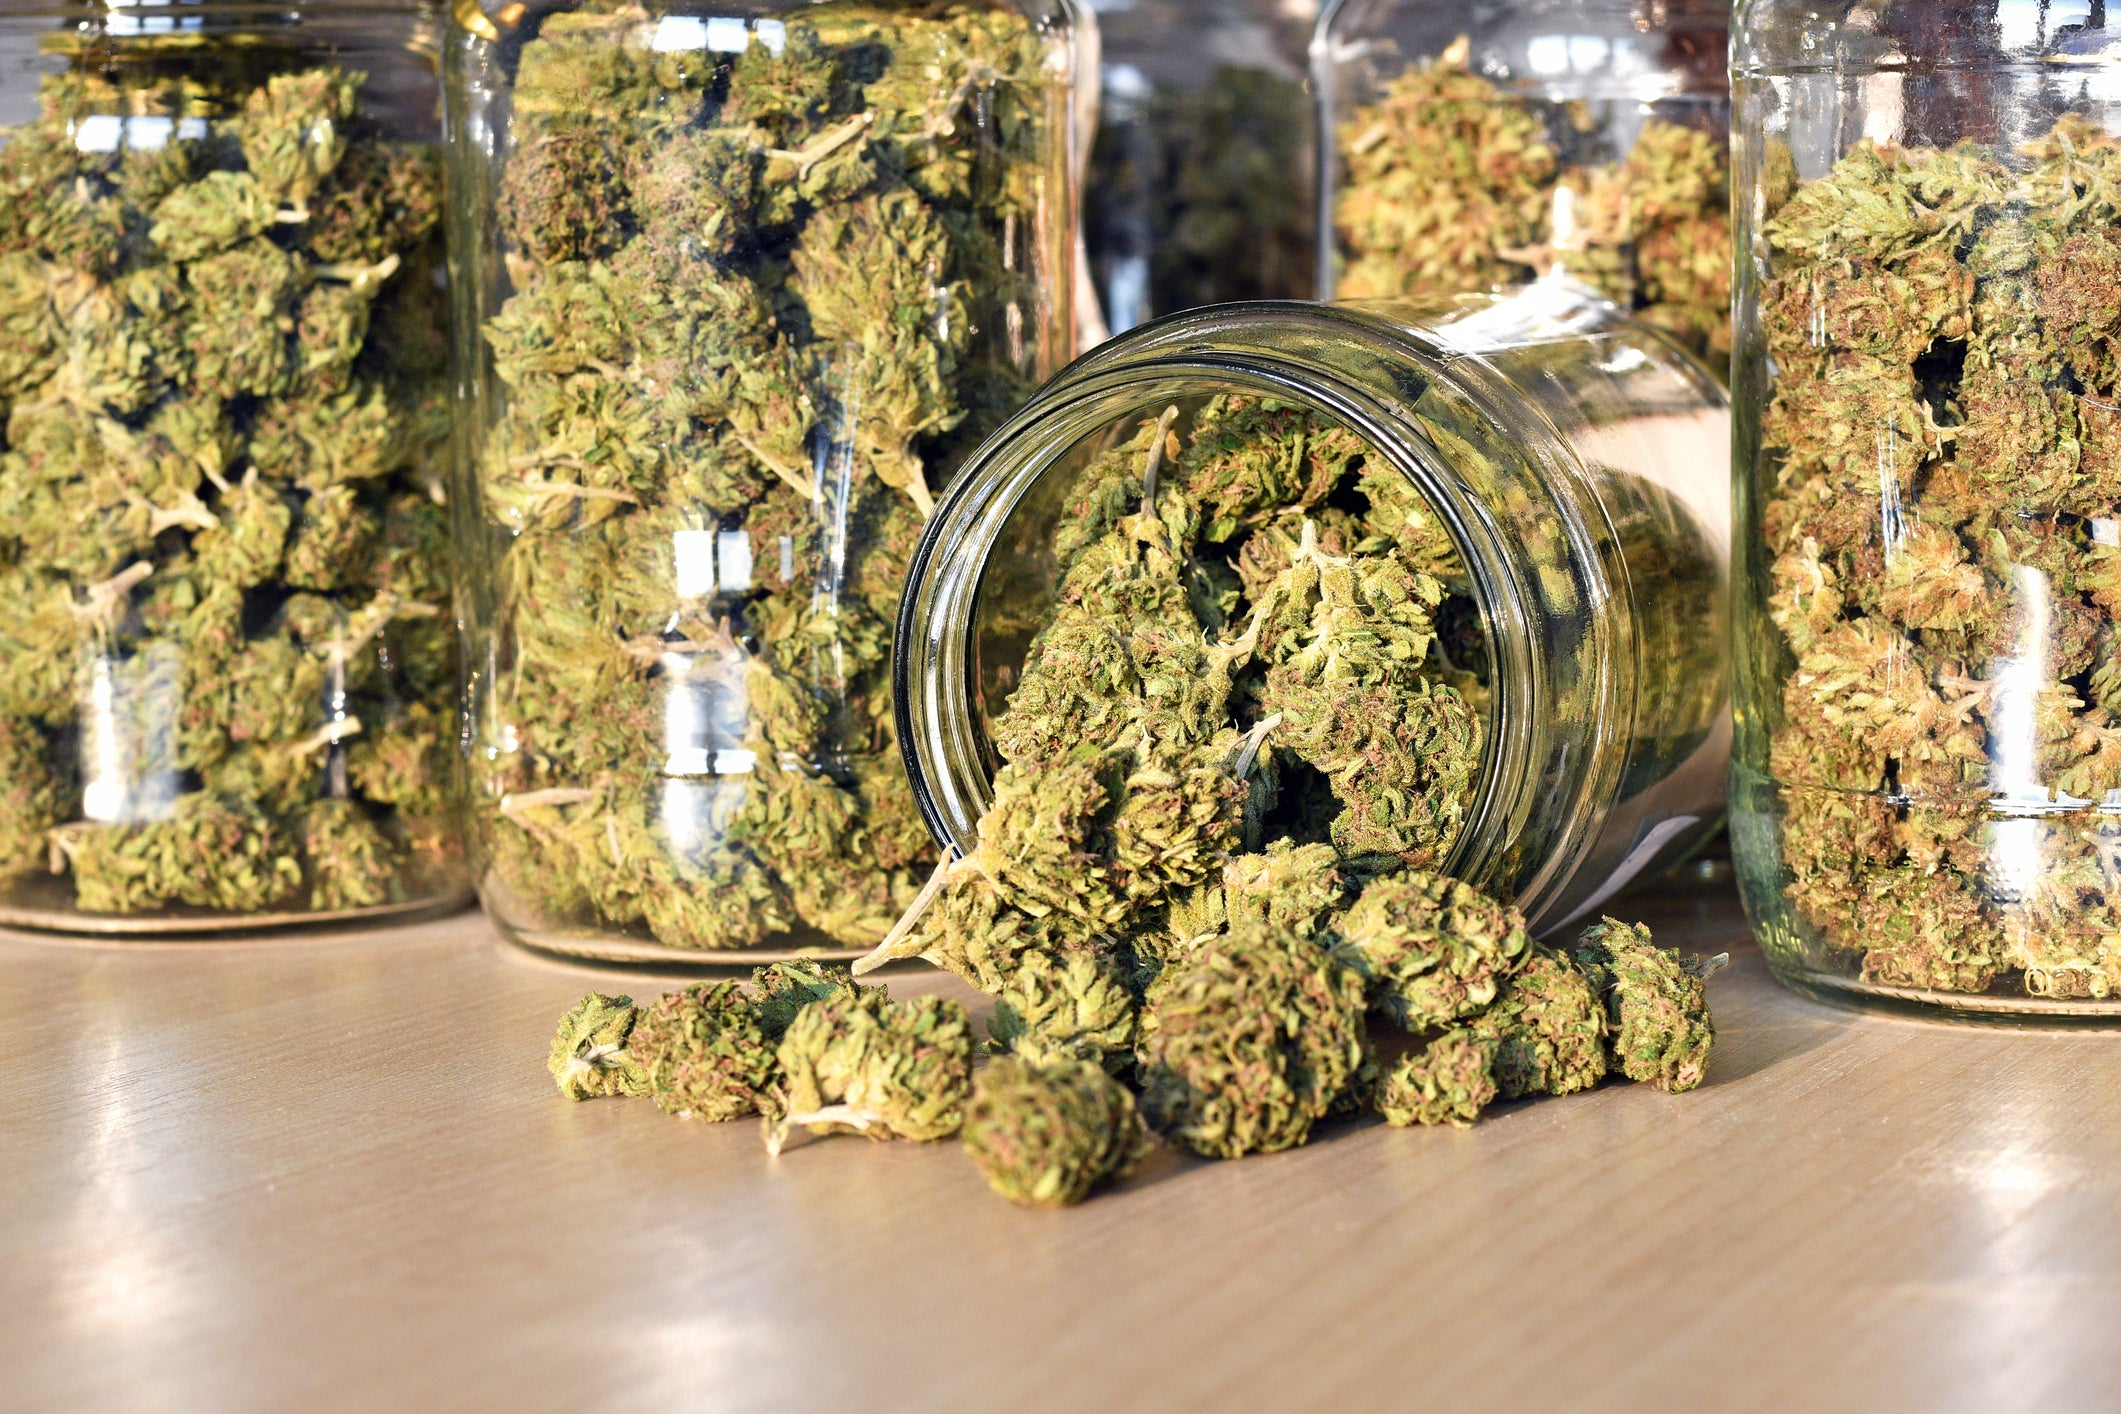 8 Canadian Marijuana Growers Expected to Top 100,000 Kilograms of